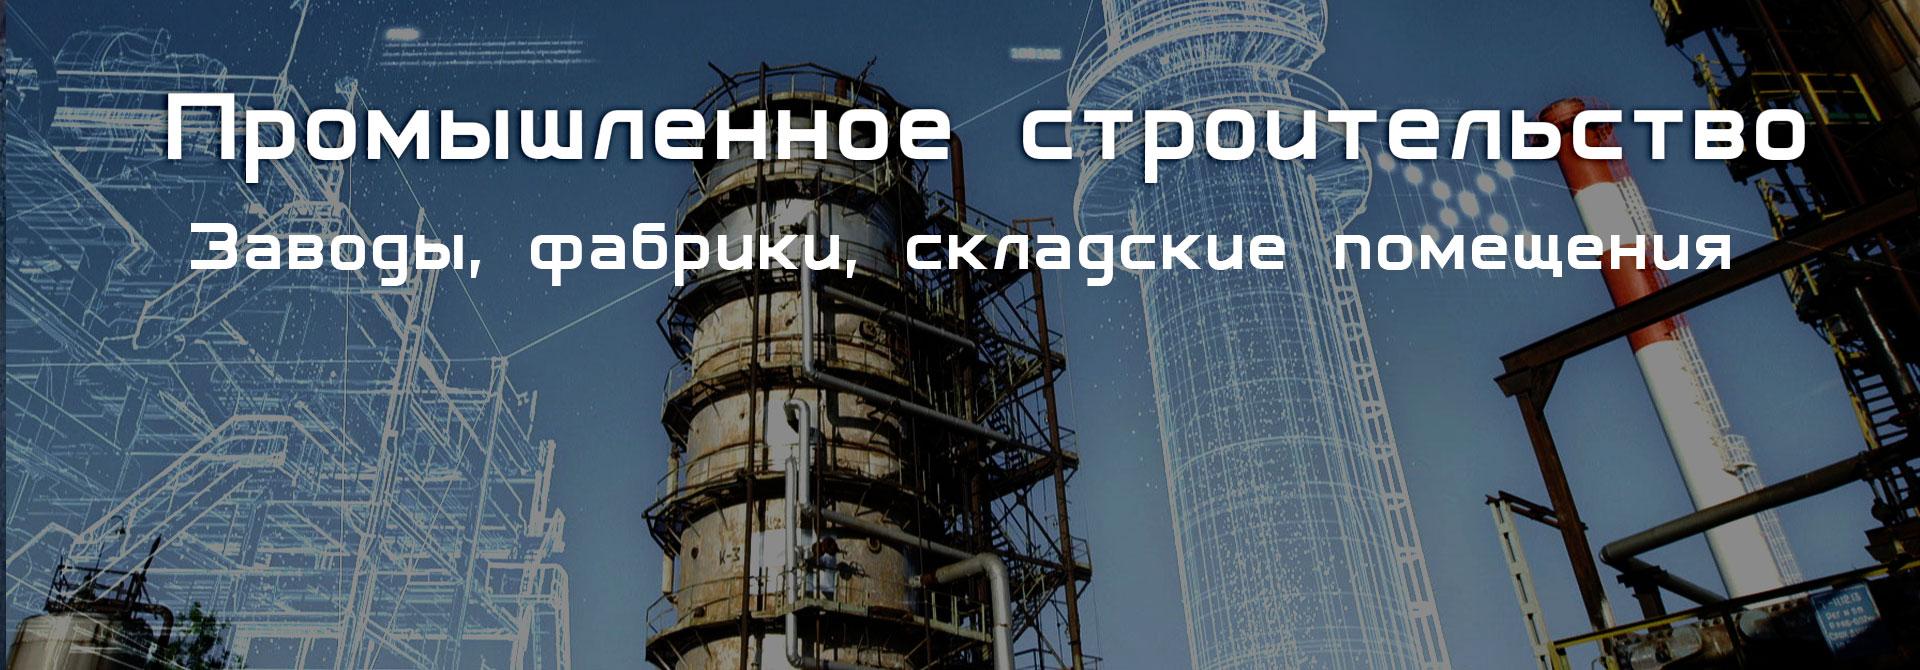 title_6093d7fcd0ba83384480251620301820